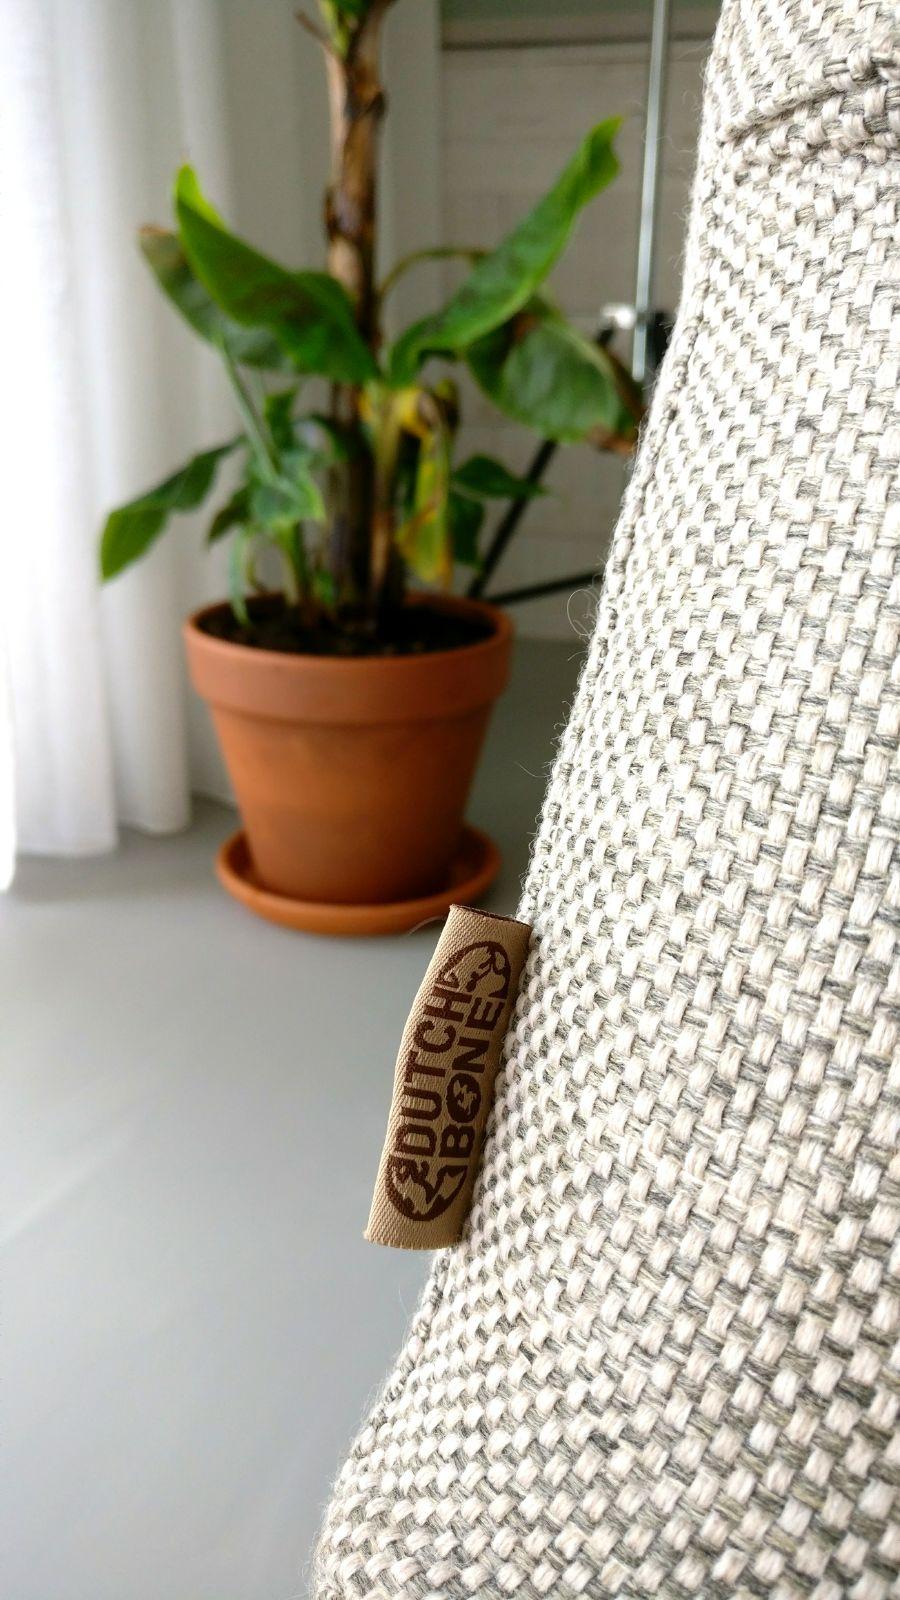 appartement nieuwbouw dutchbone fauteuil bananenplant groen urban jungl.jpg